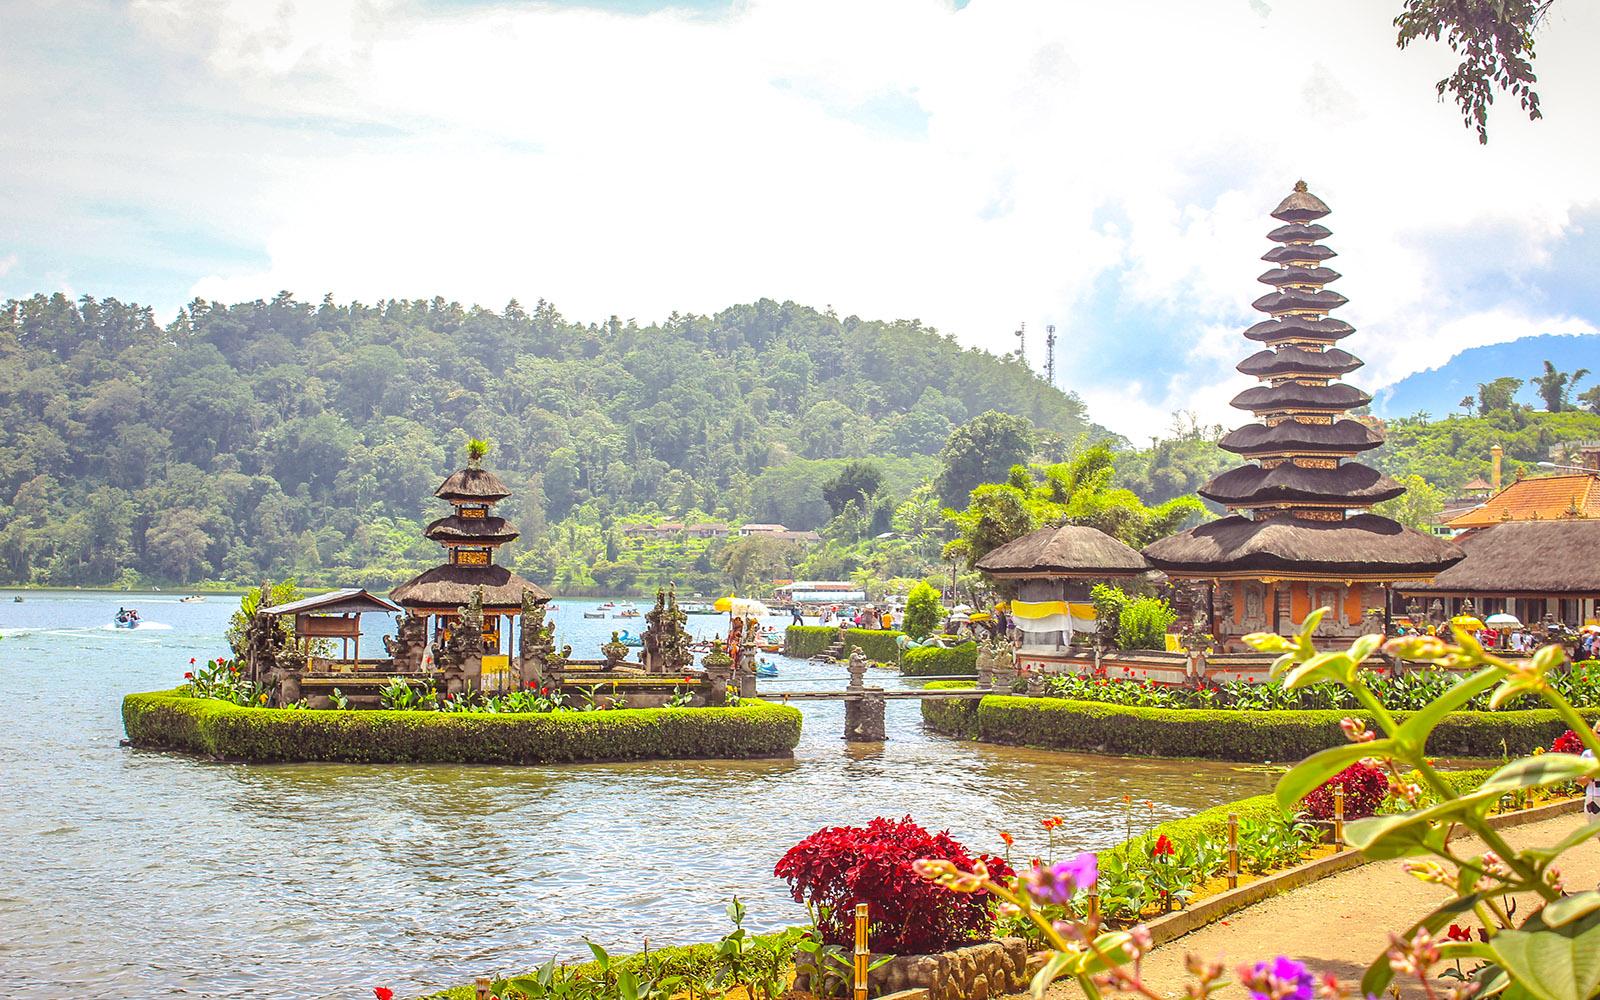 Ulun danu temple at beratan lake - Bali